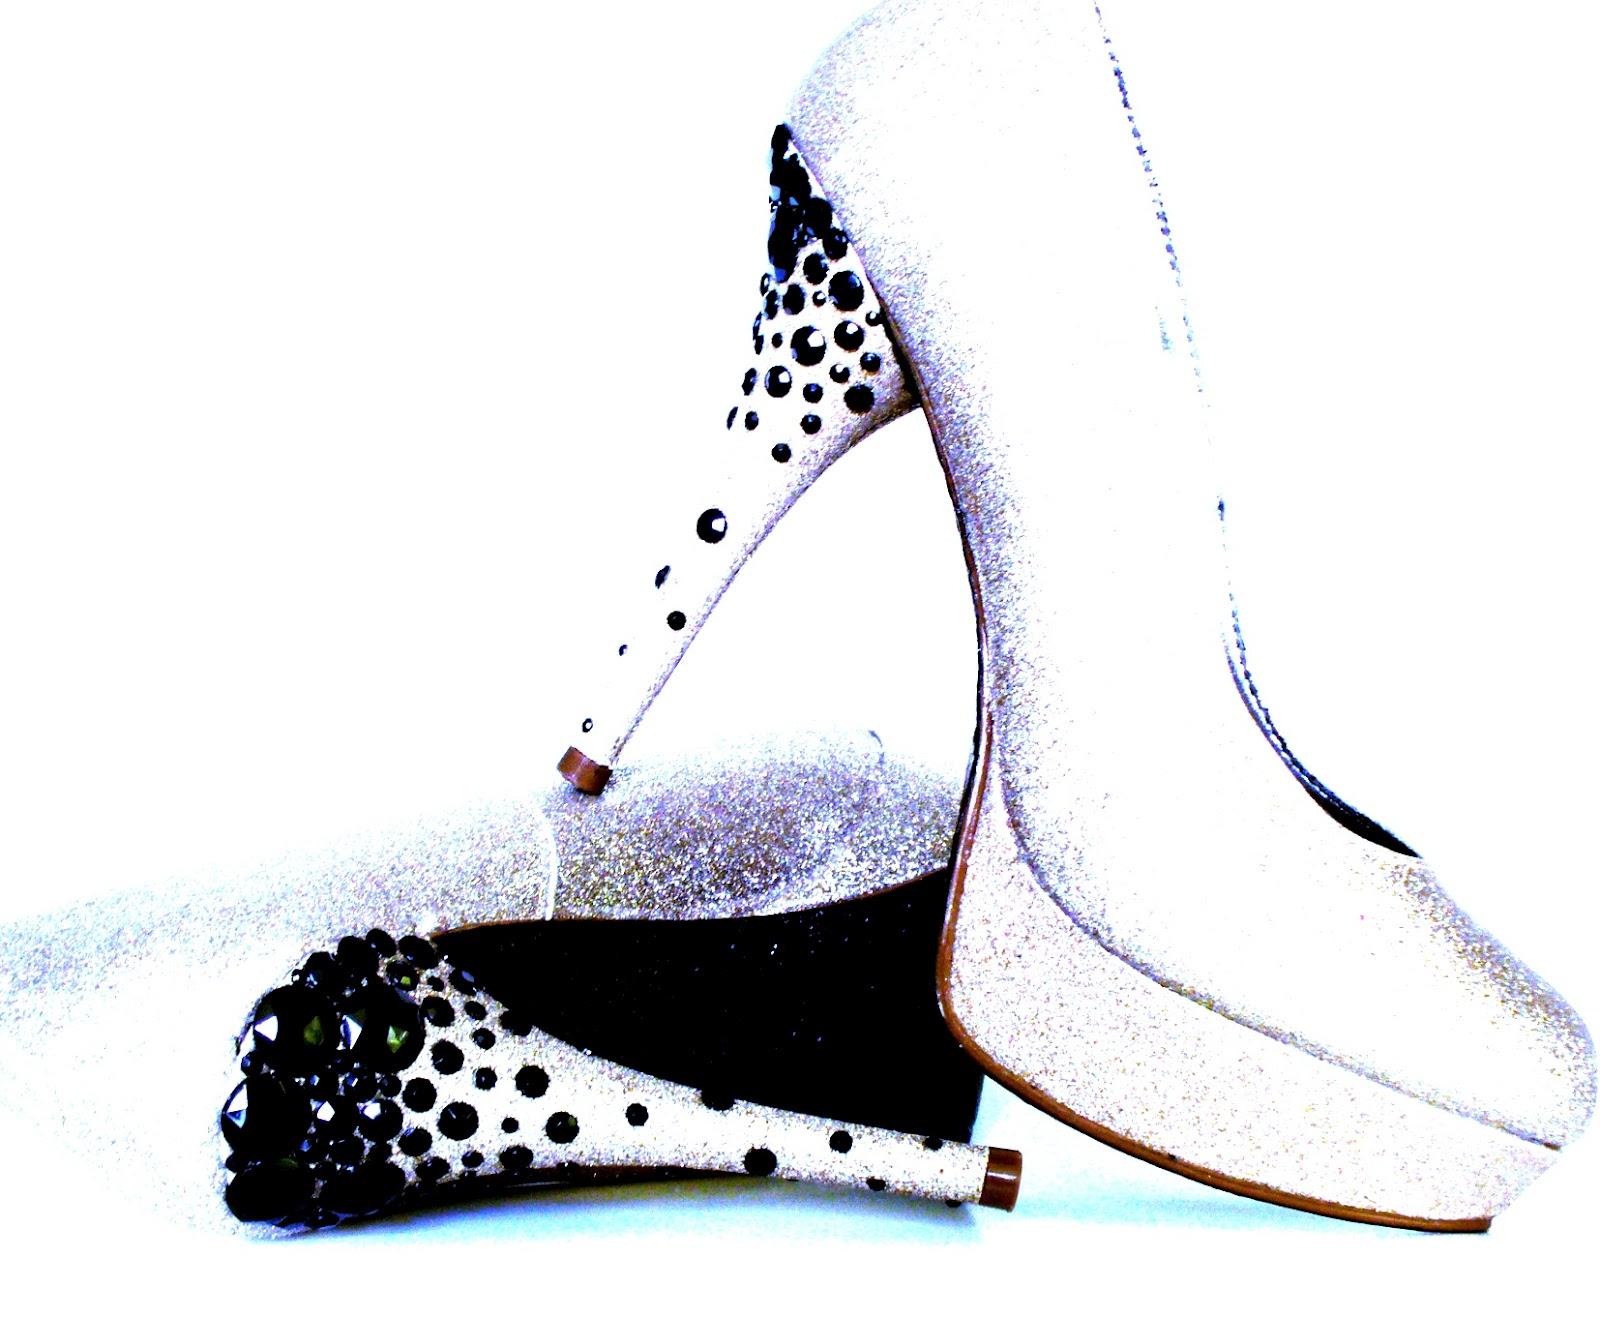 cc79bb2b1a37 Custom Order: Black and Gold Rhinestone Heels Sparkle Glitter Shoes